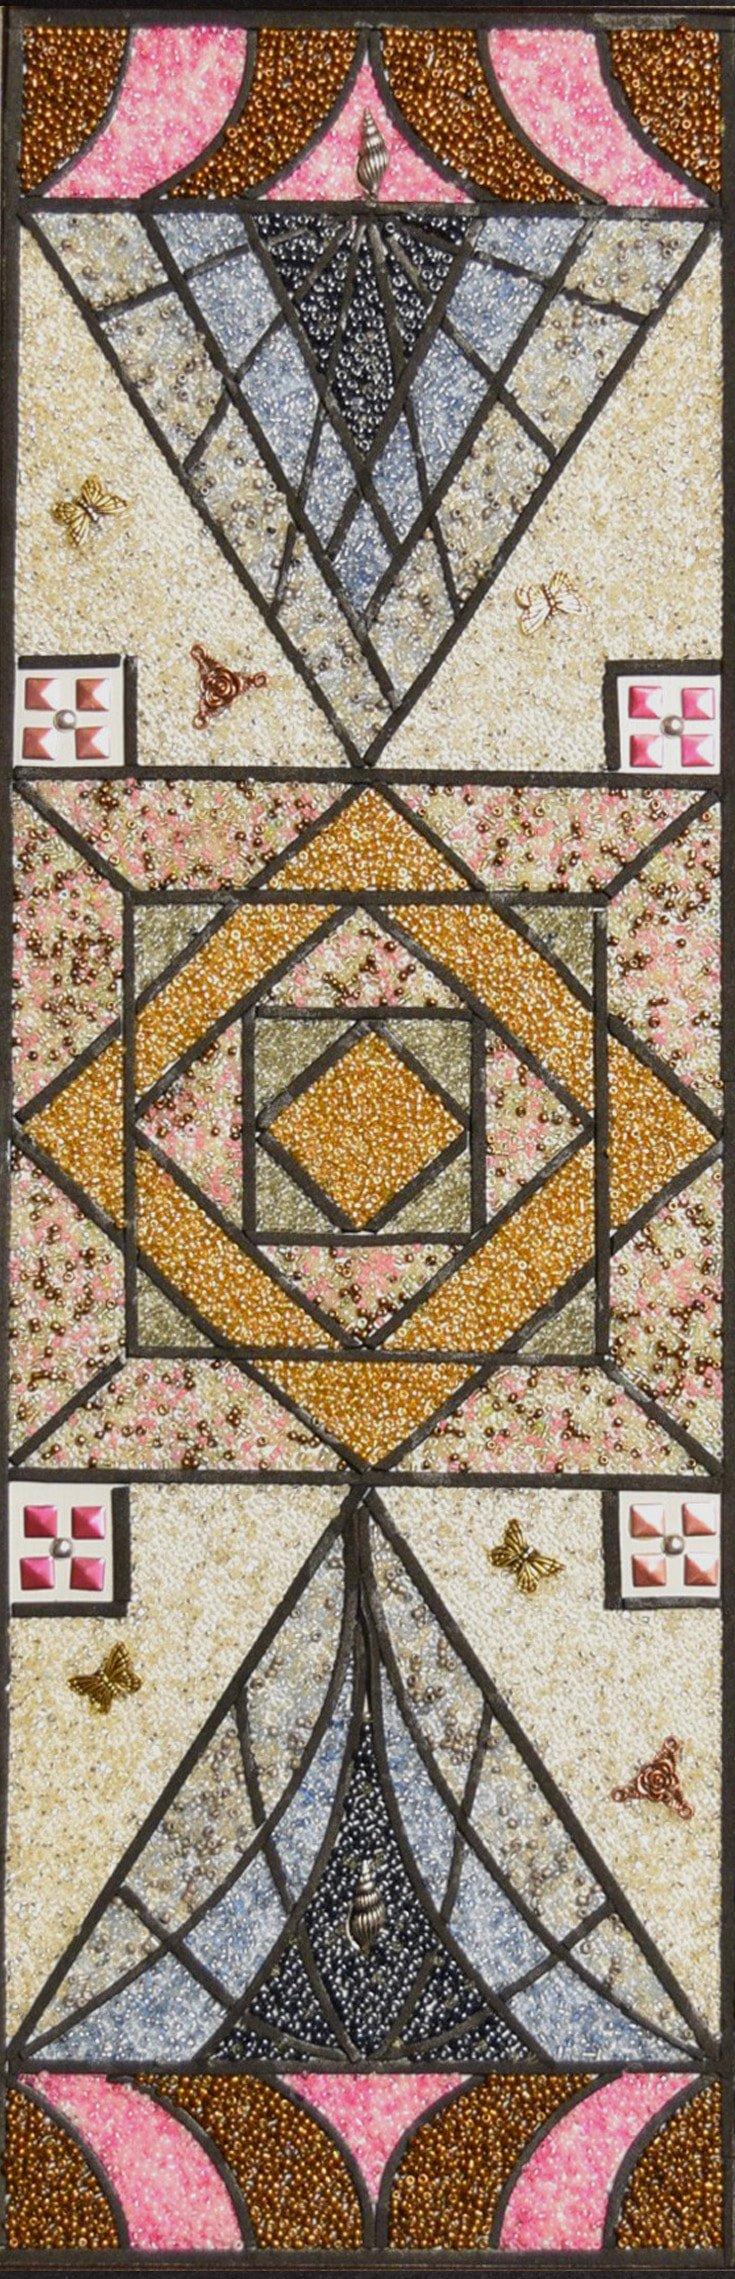 Deco 2 Glass Mosaic